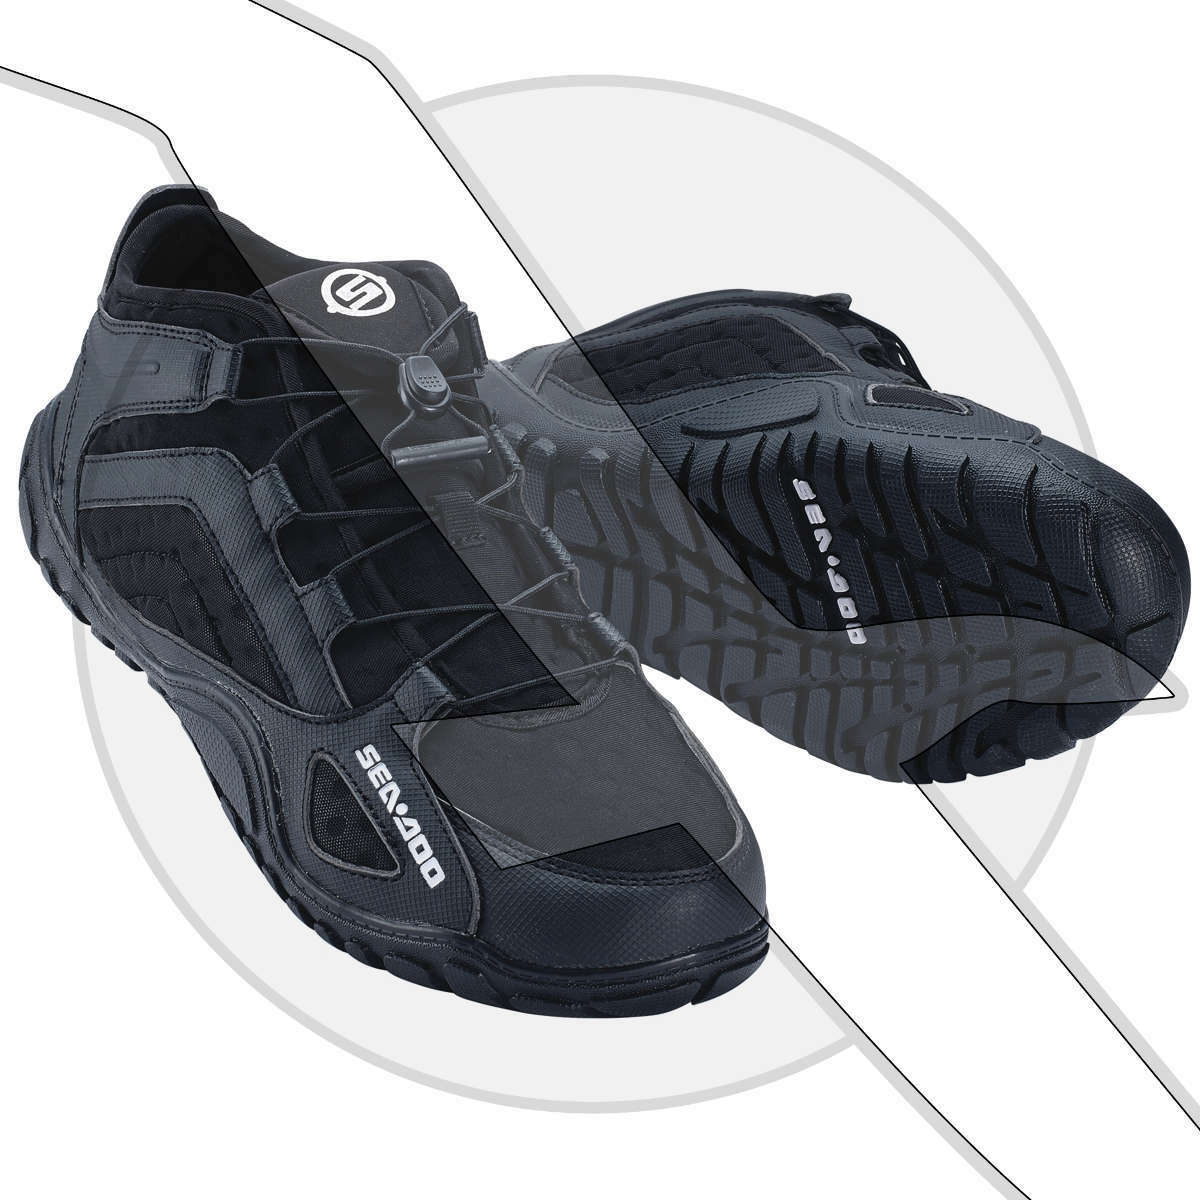 Sea Doo Watercraft Neoprene Riding Water shoes  Jet Ski Seadoo Jetski  best quality